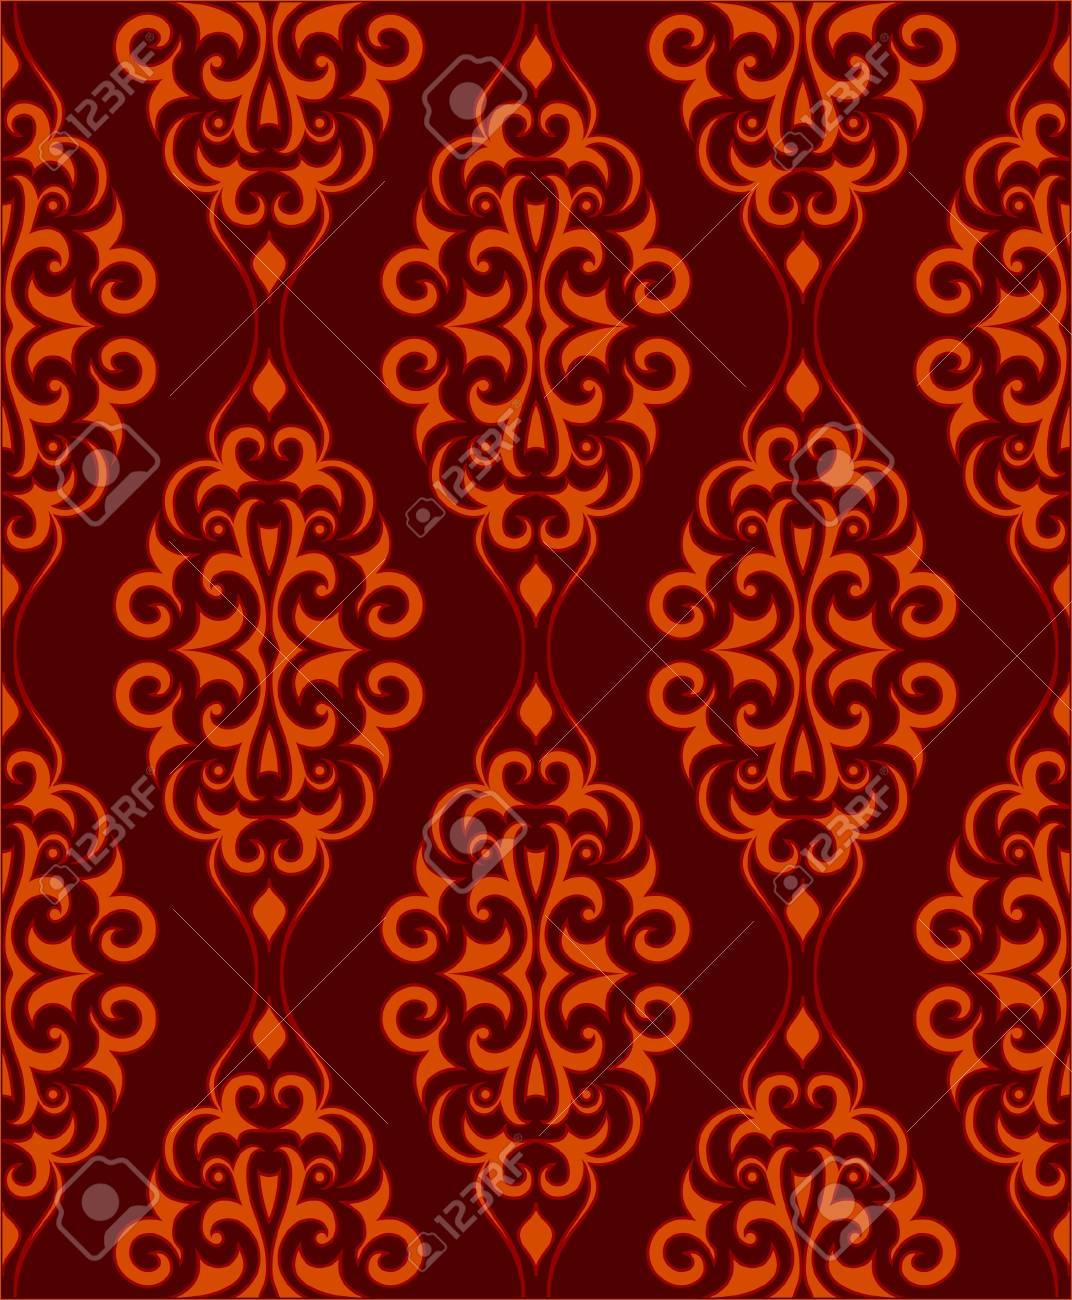 Ornamental wallpaper that will tile seamlessly Stock Vector - 3457314